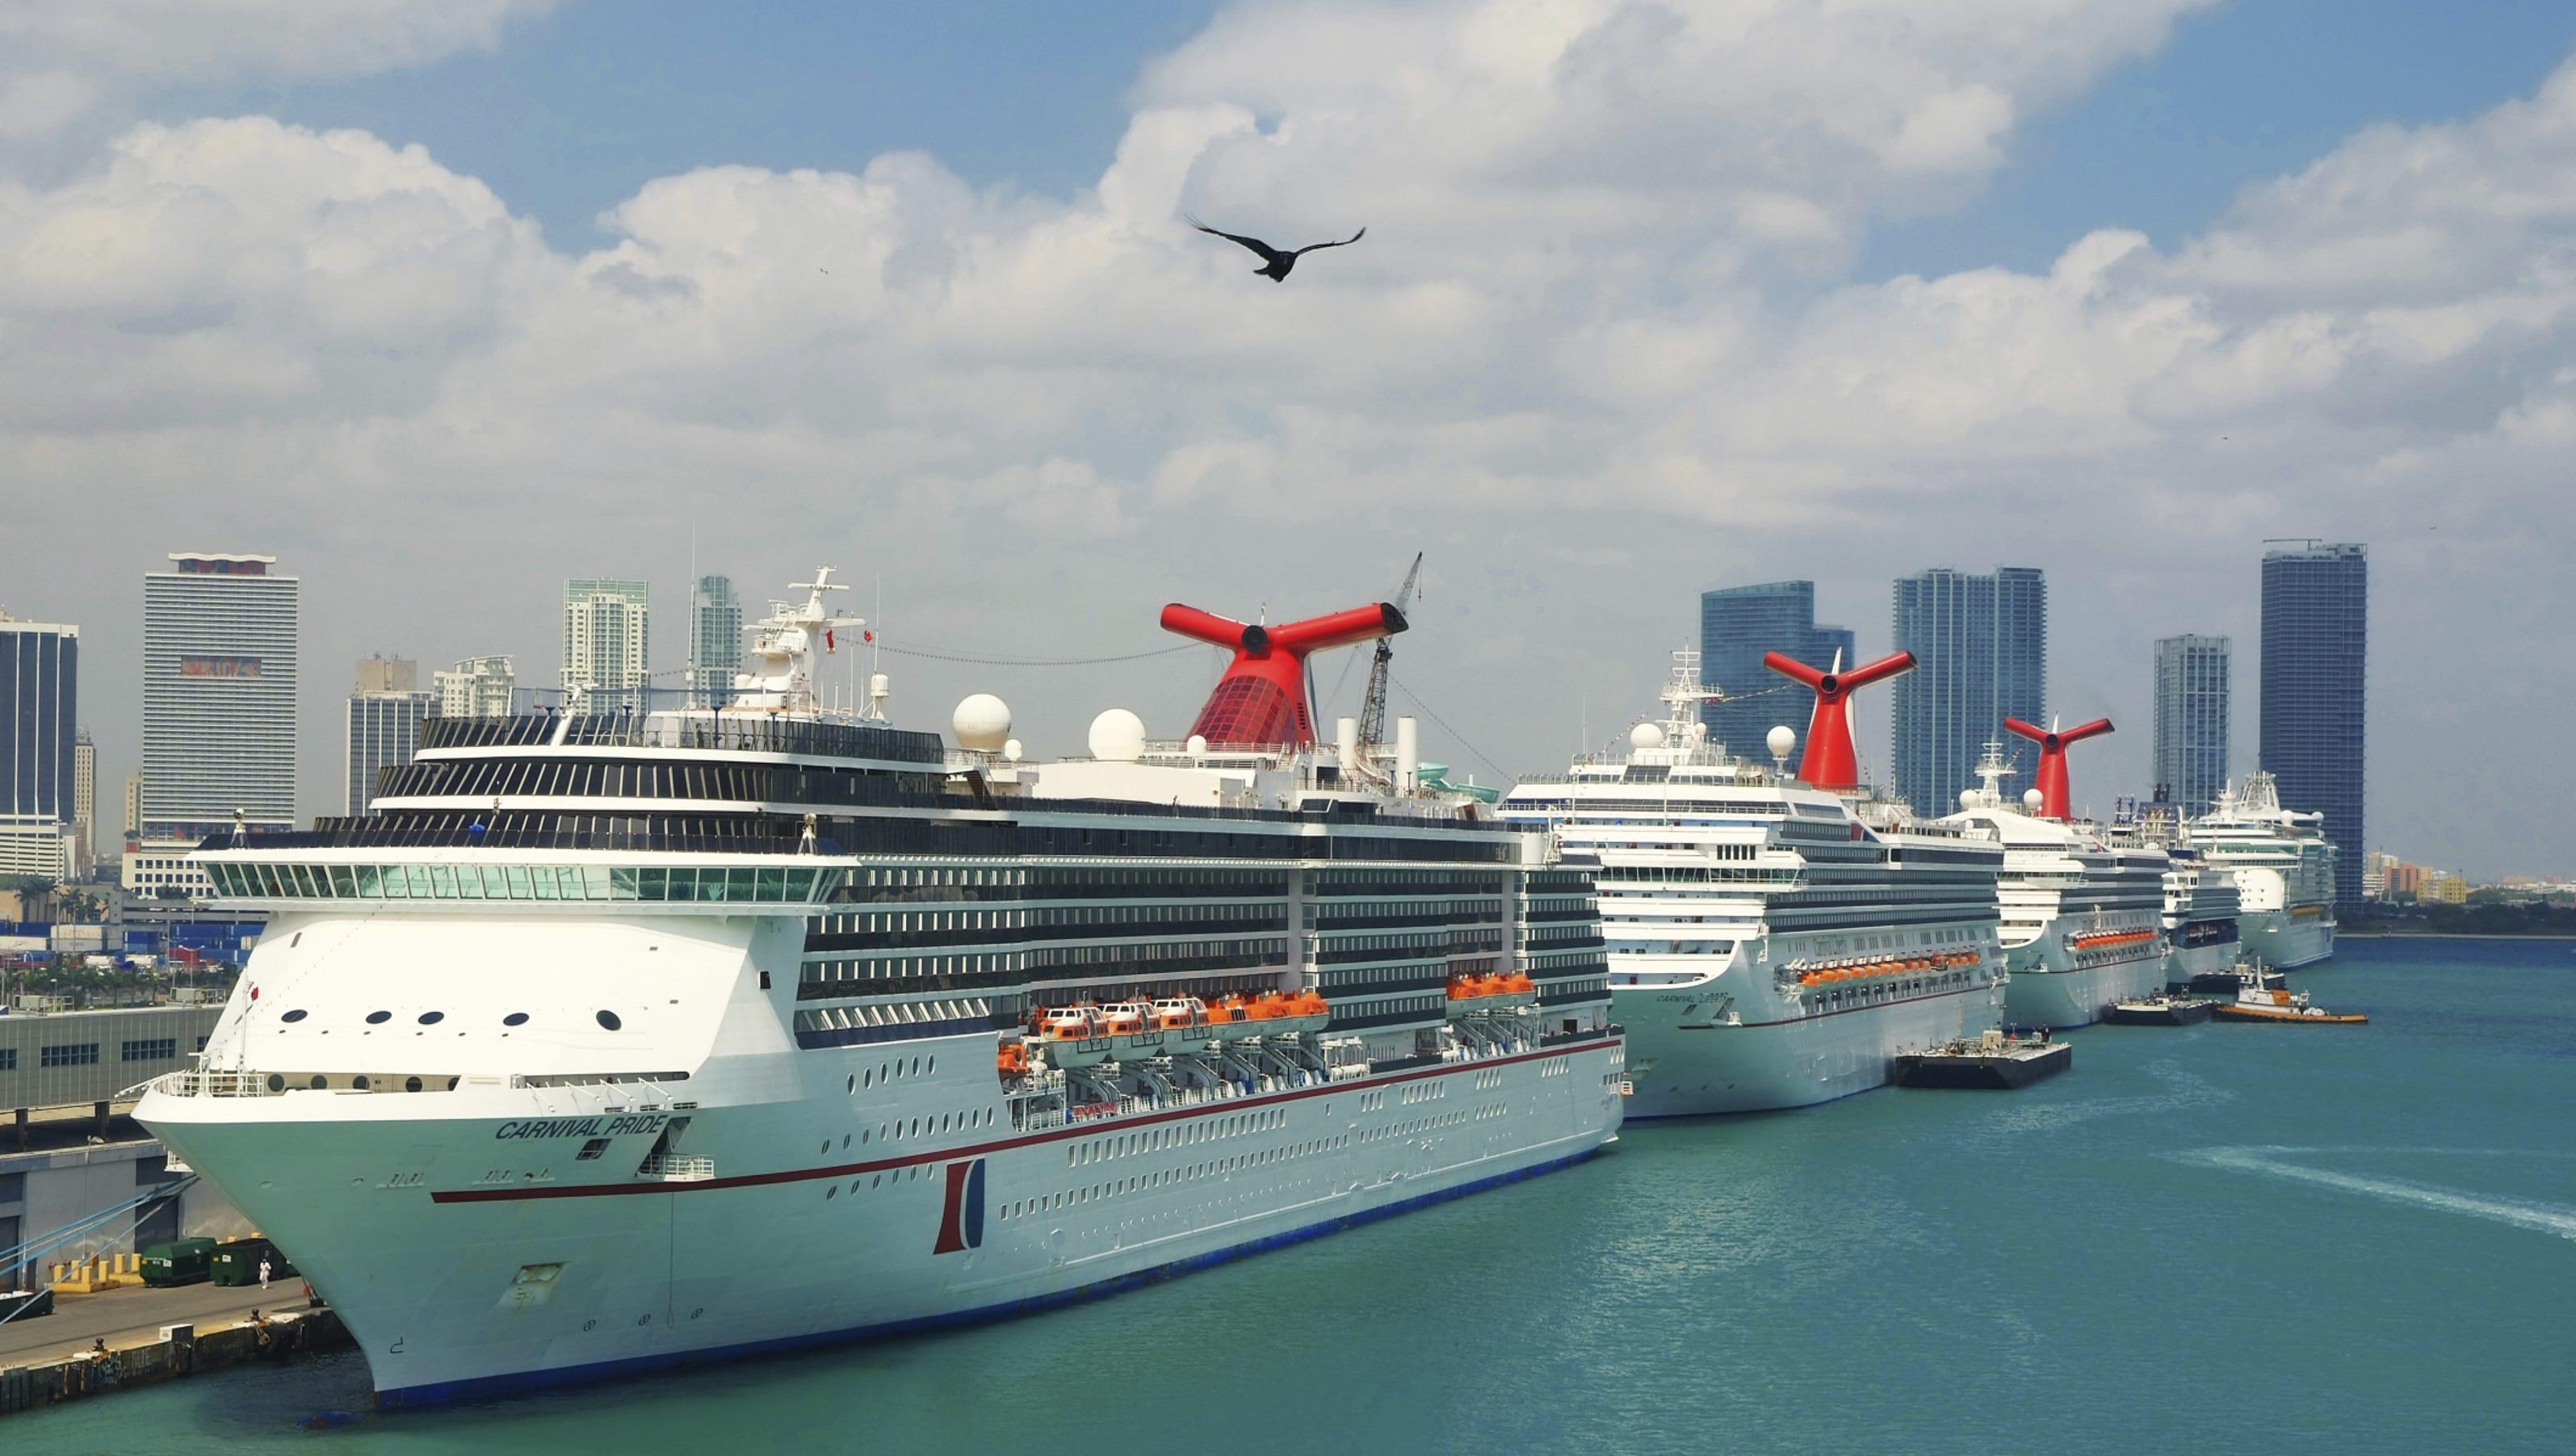 Celebrity Equinox Cruise Ship - Miami, FL - Yelp